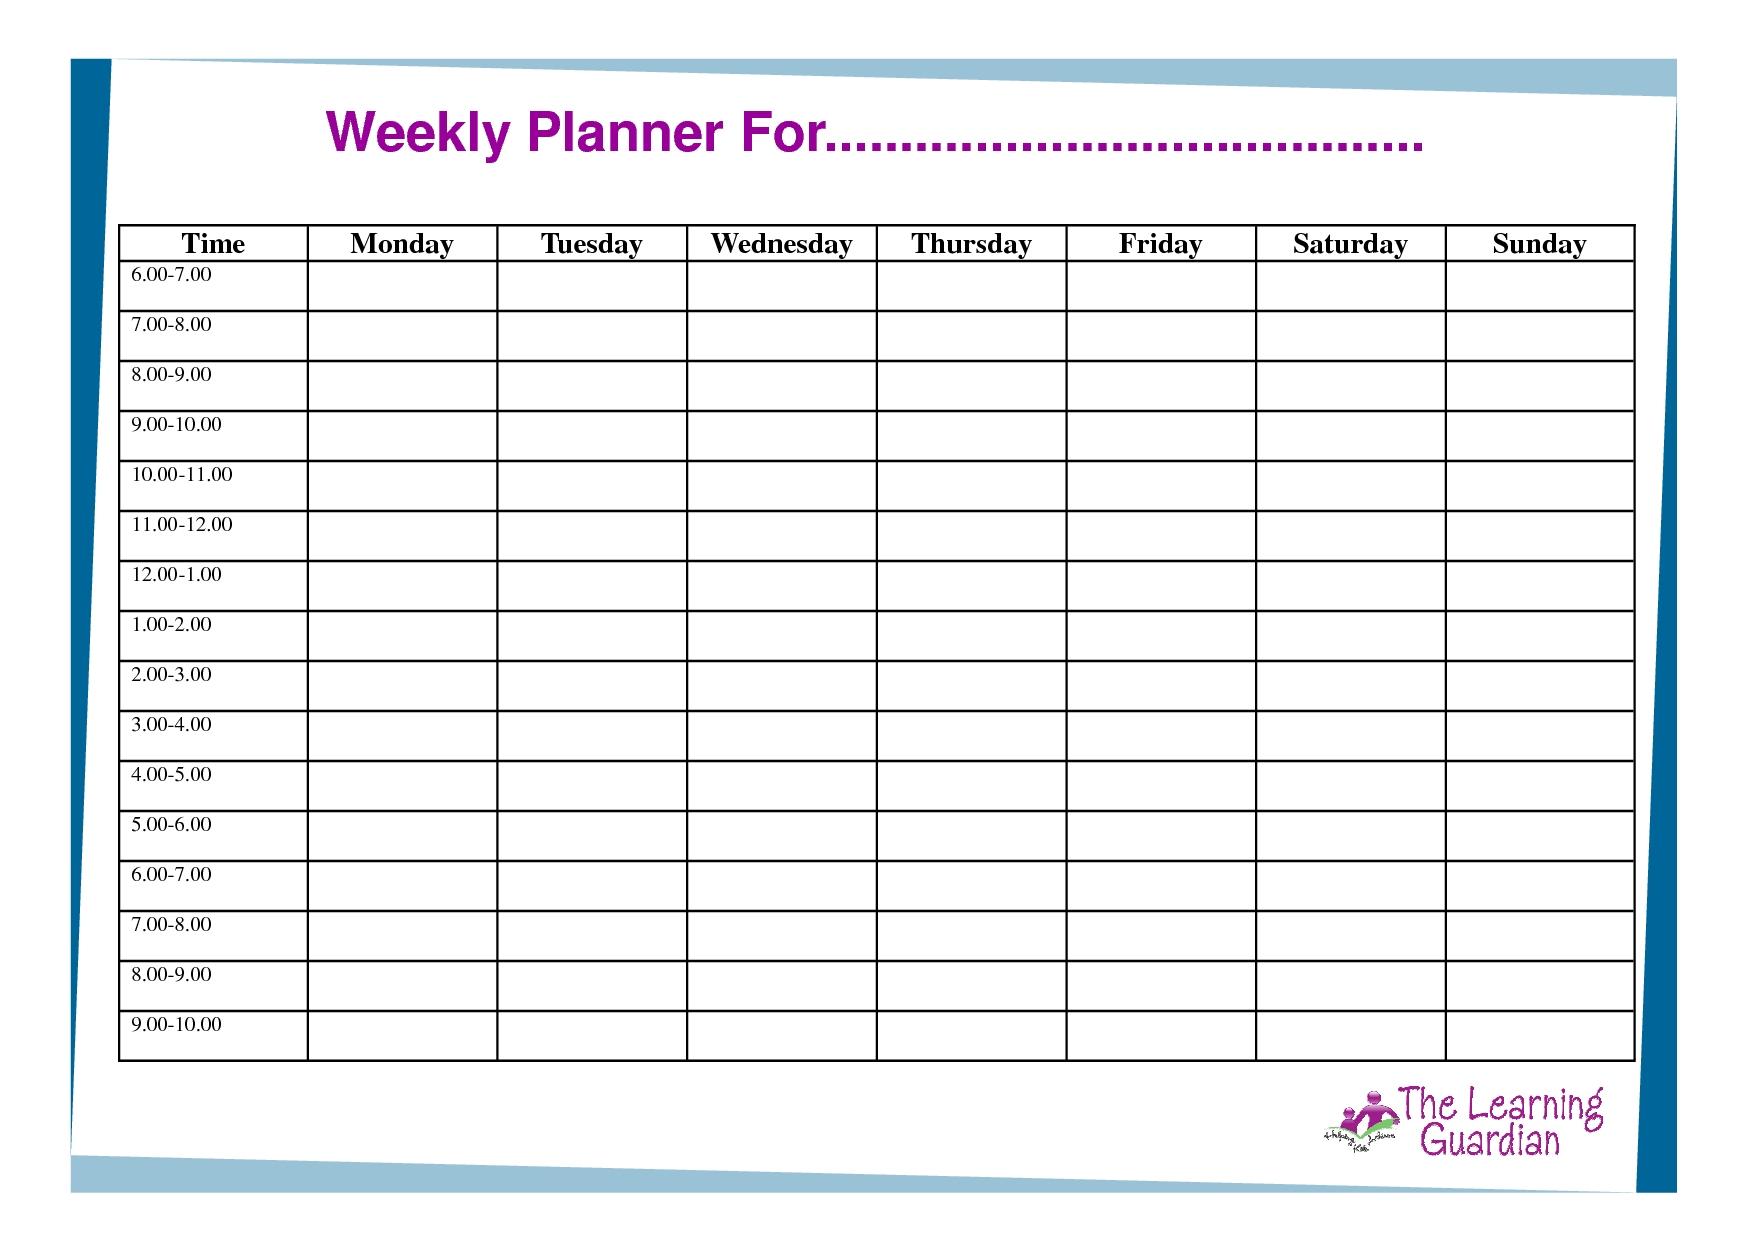 Free Printable Weekly Calendar Templates | Weekly Planner For Time inside Free Printable Weekly Schedule Planner